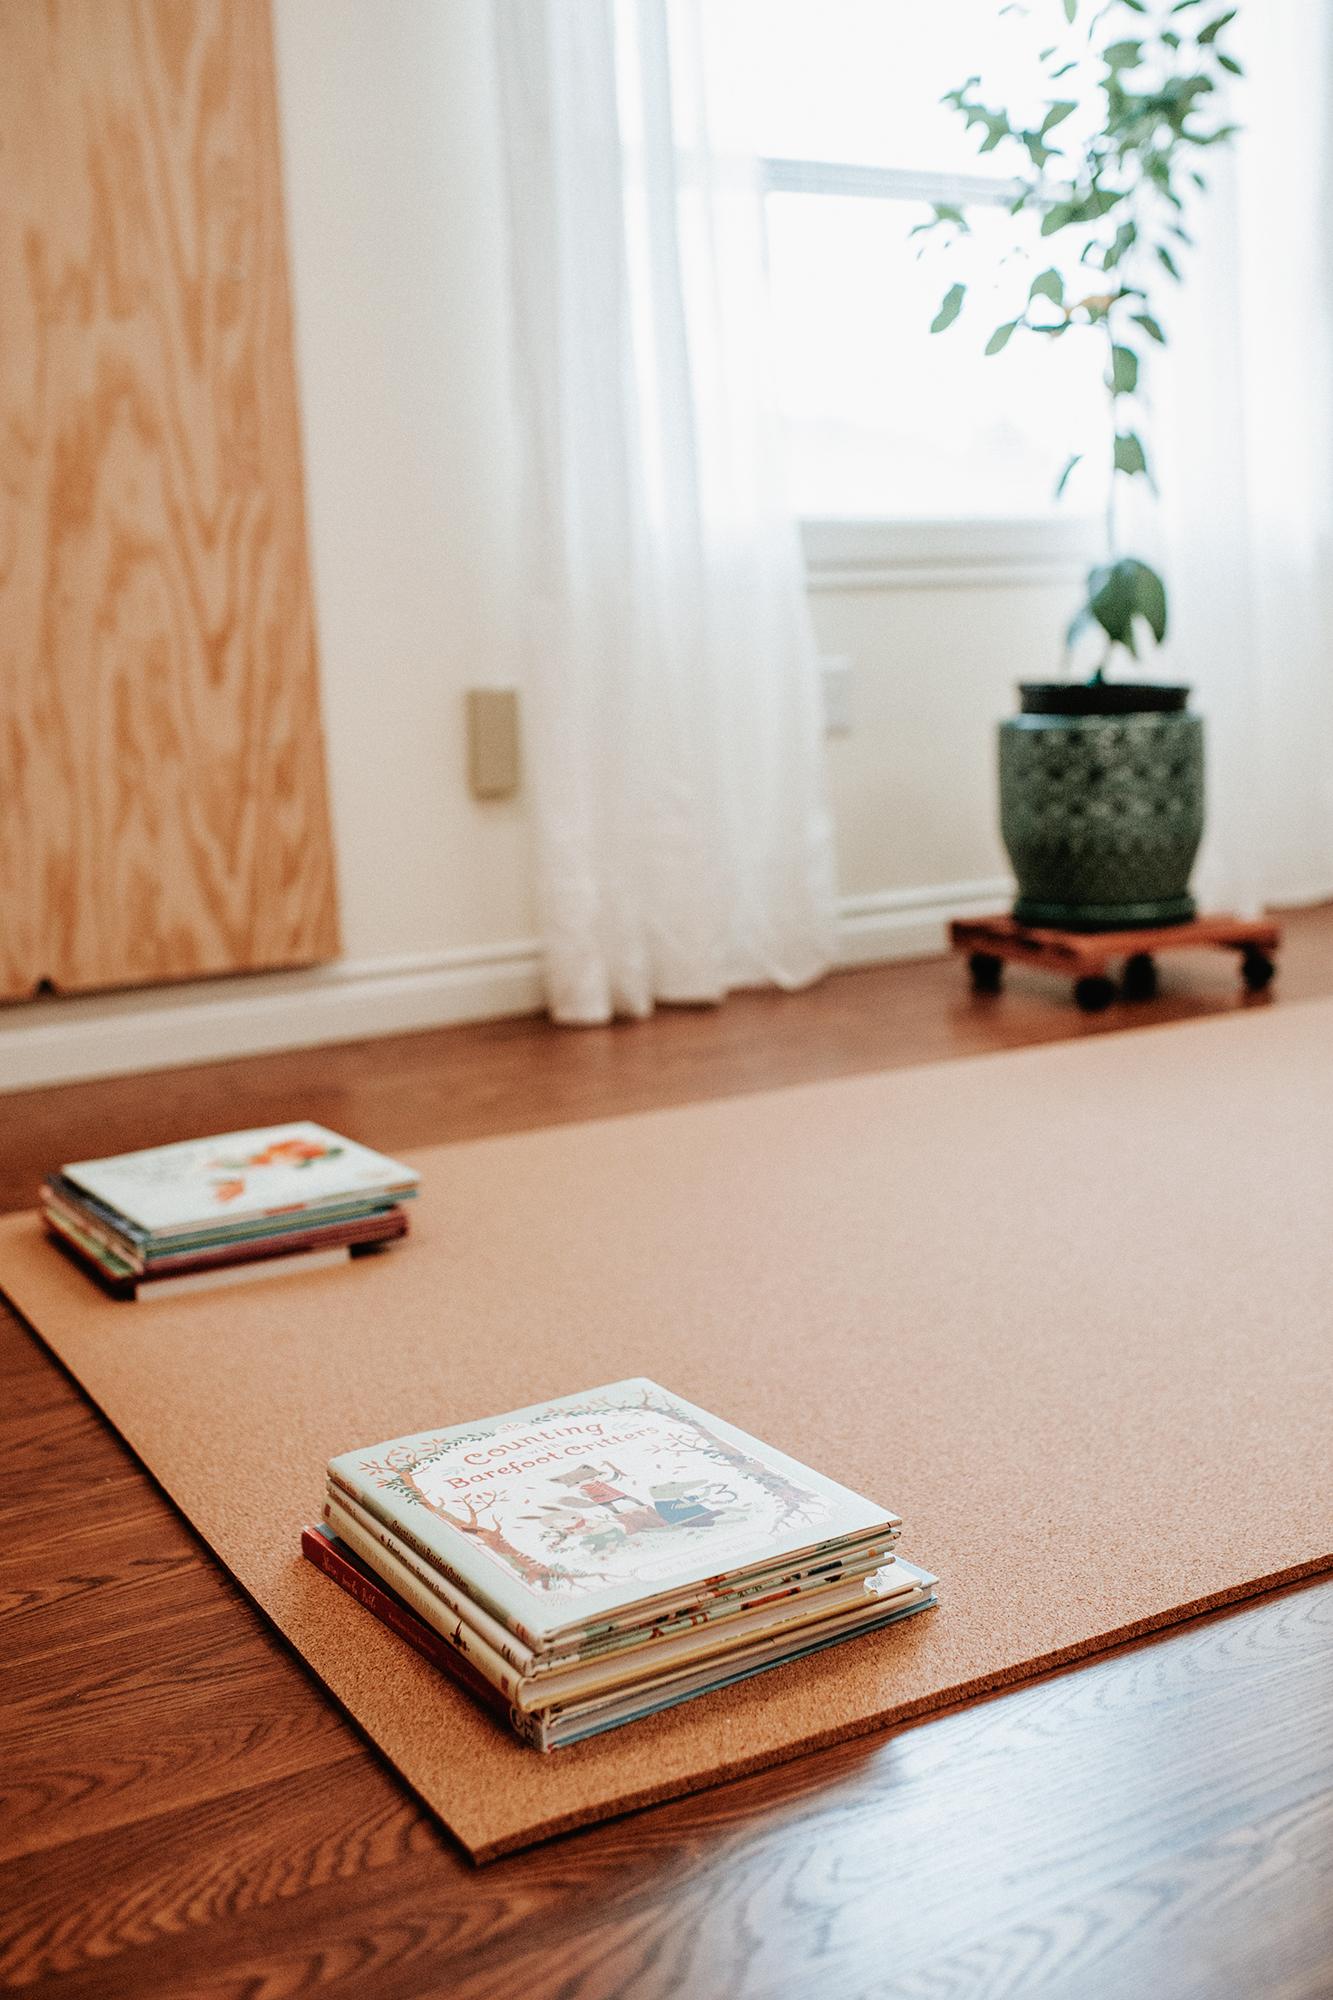 diy-cork-board-wall-flat.jpg